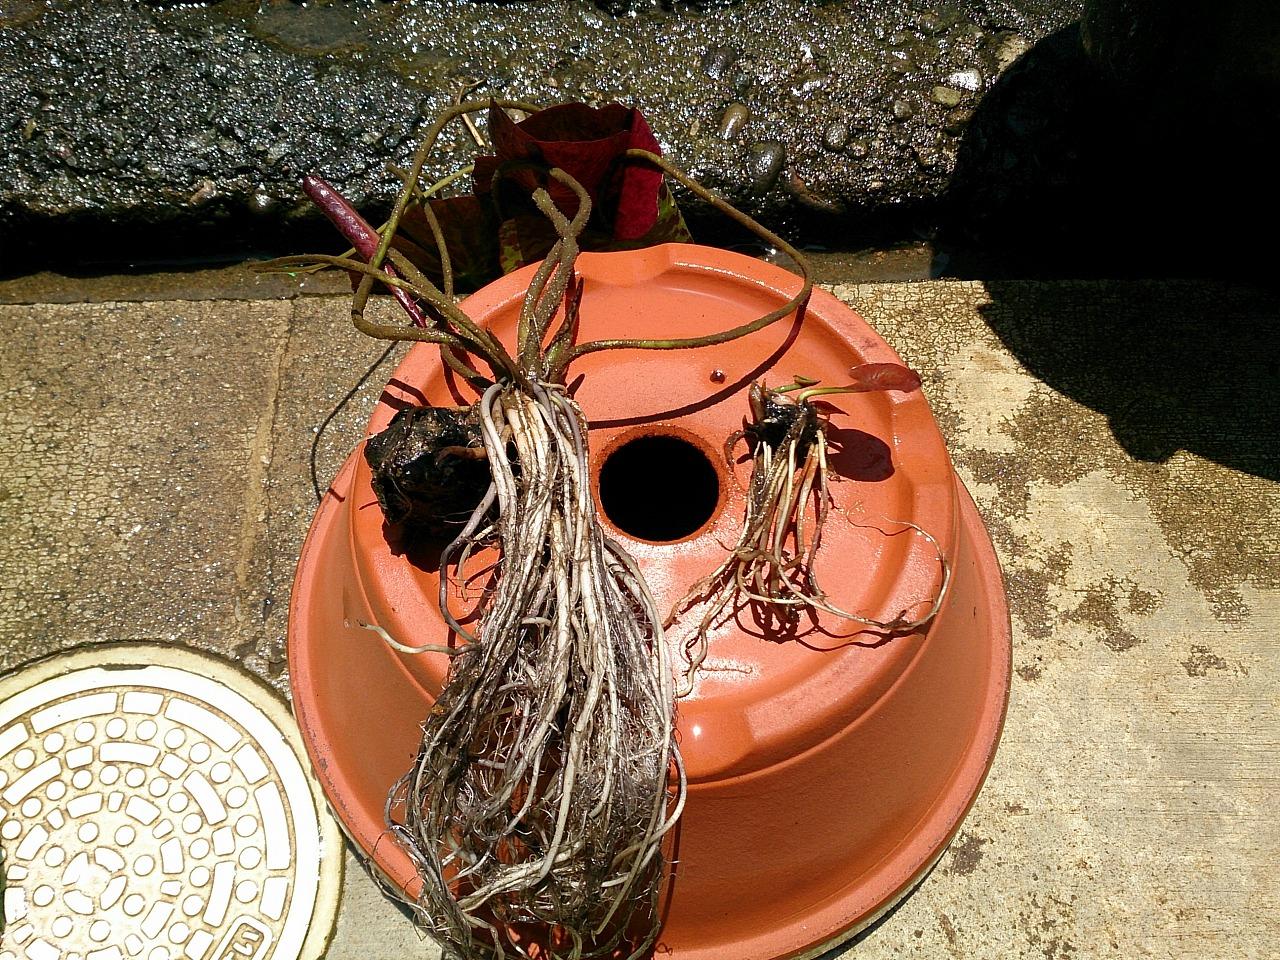 Planting-02_20140712.jpg